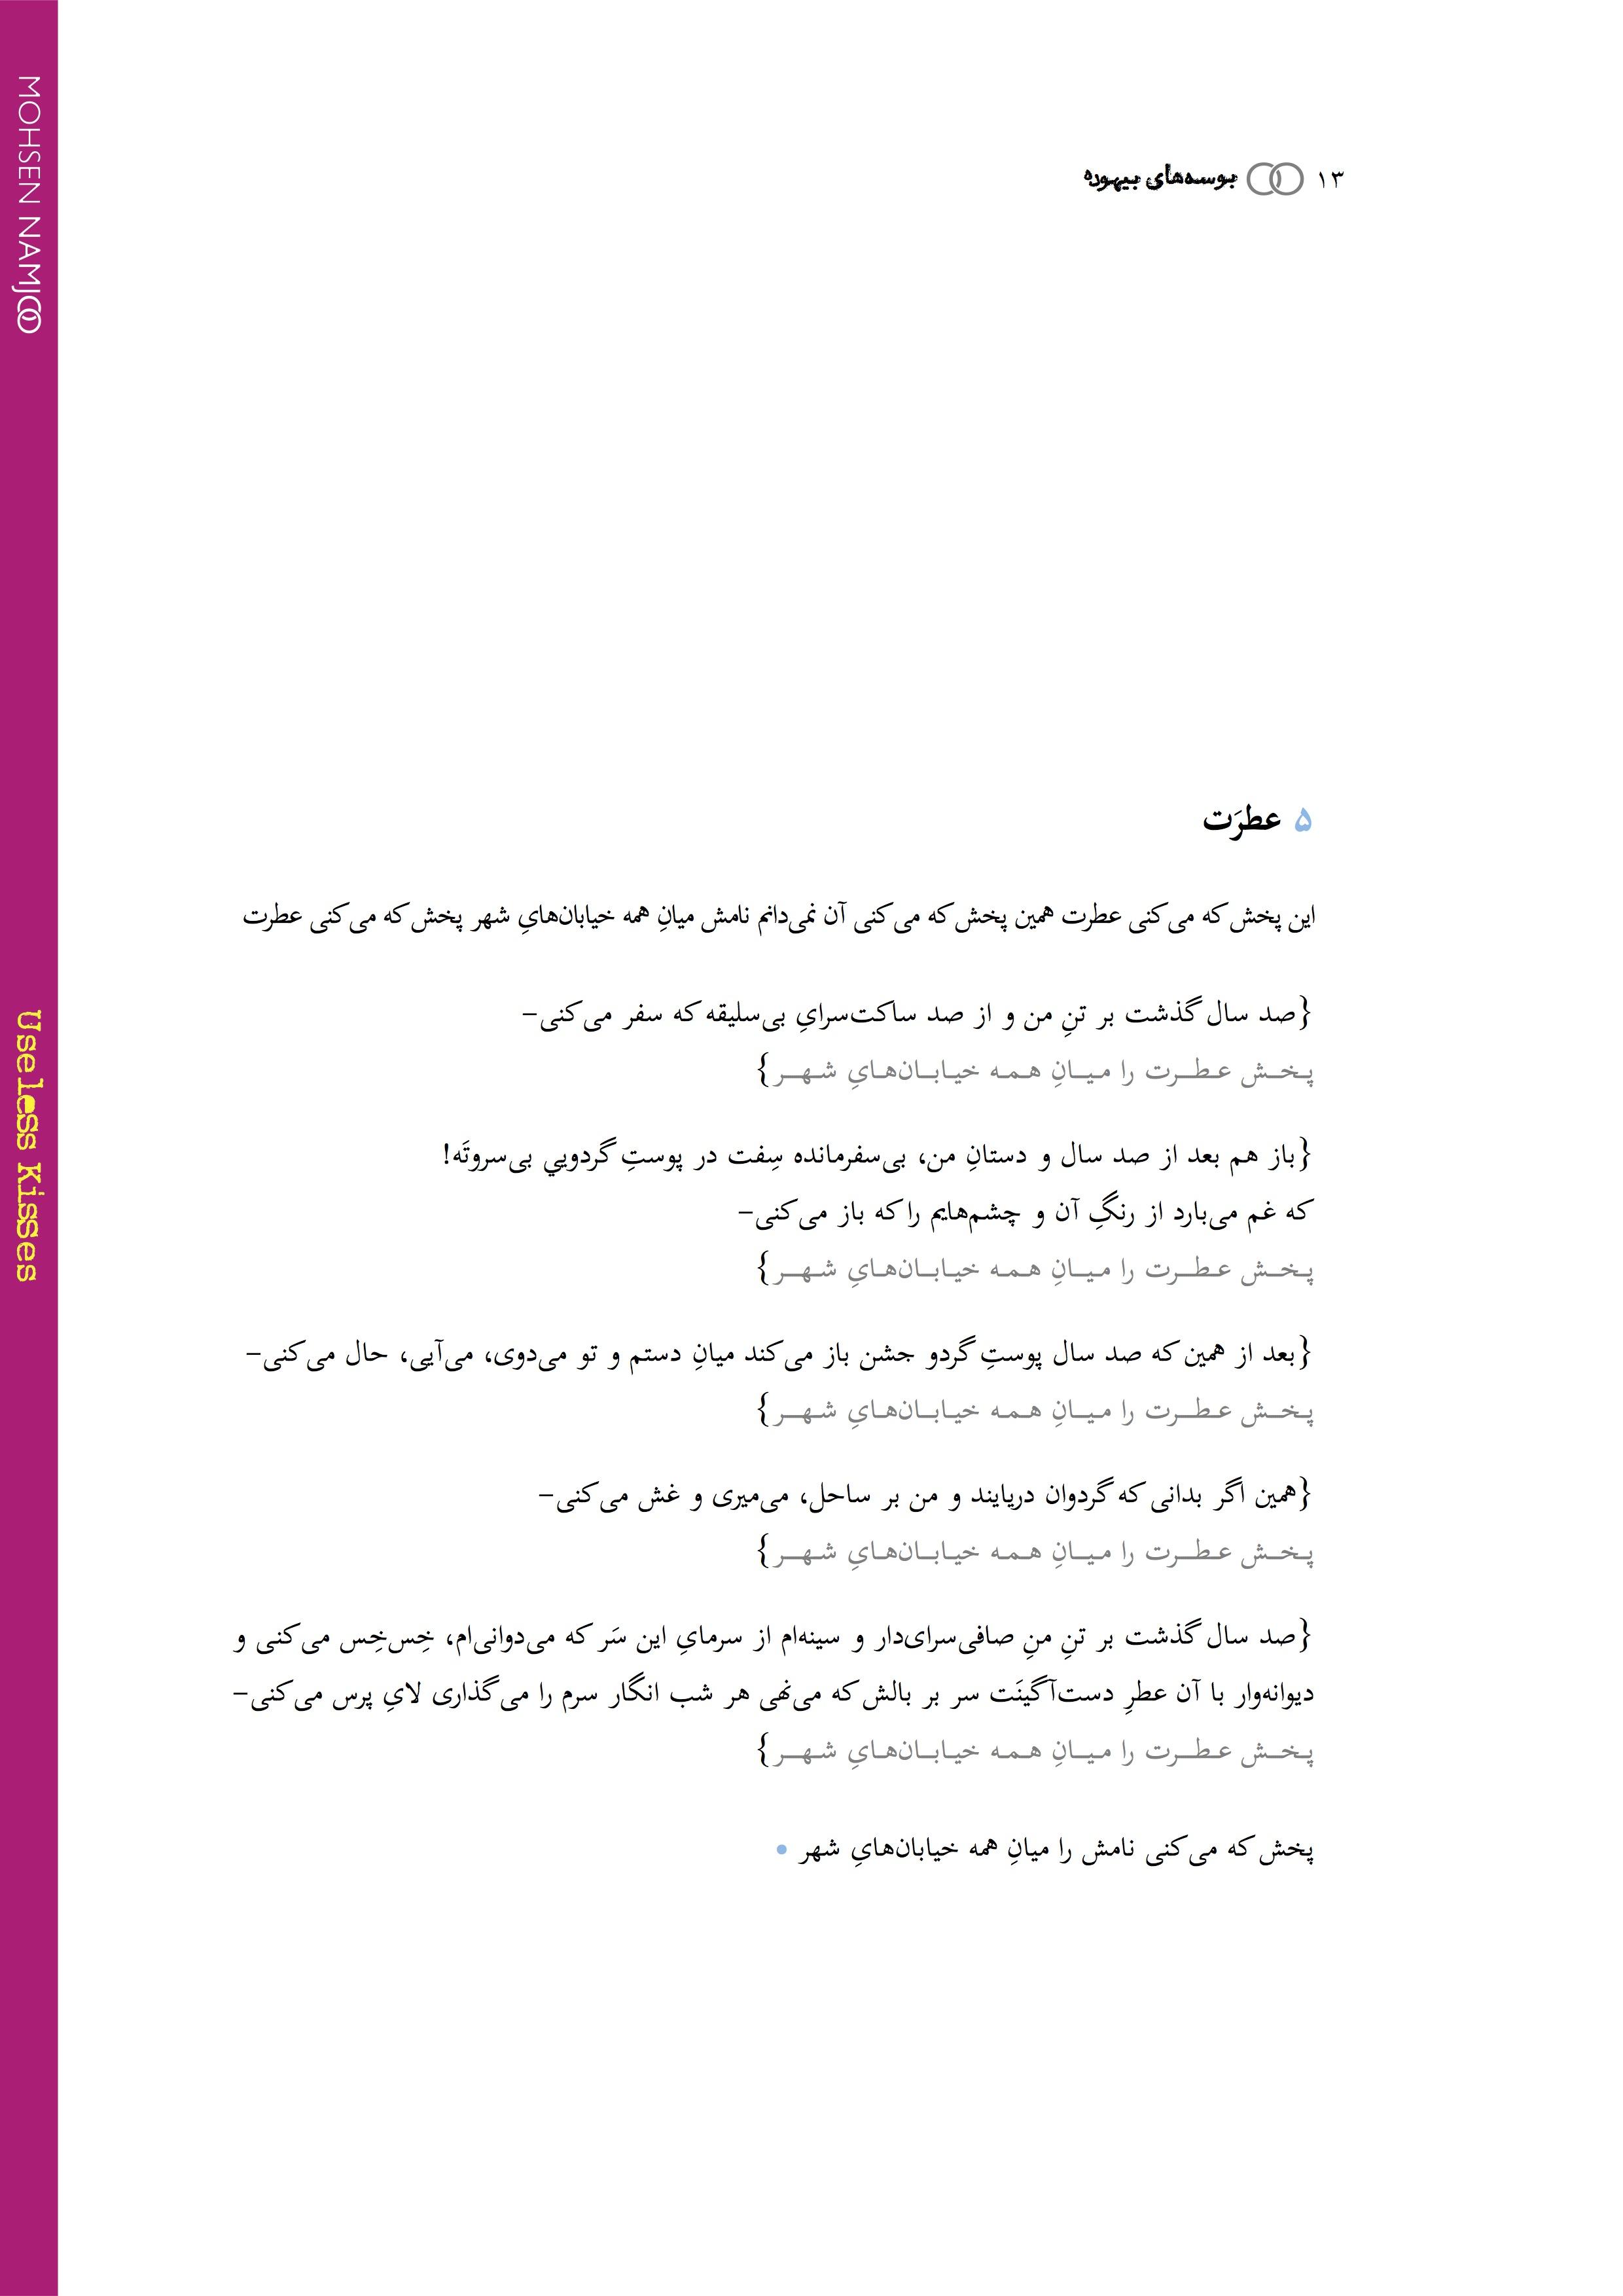 12Useless Kisses eBook (2nd Edition).jpg